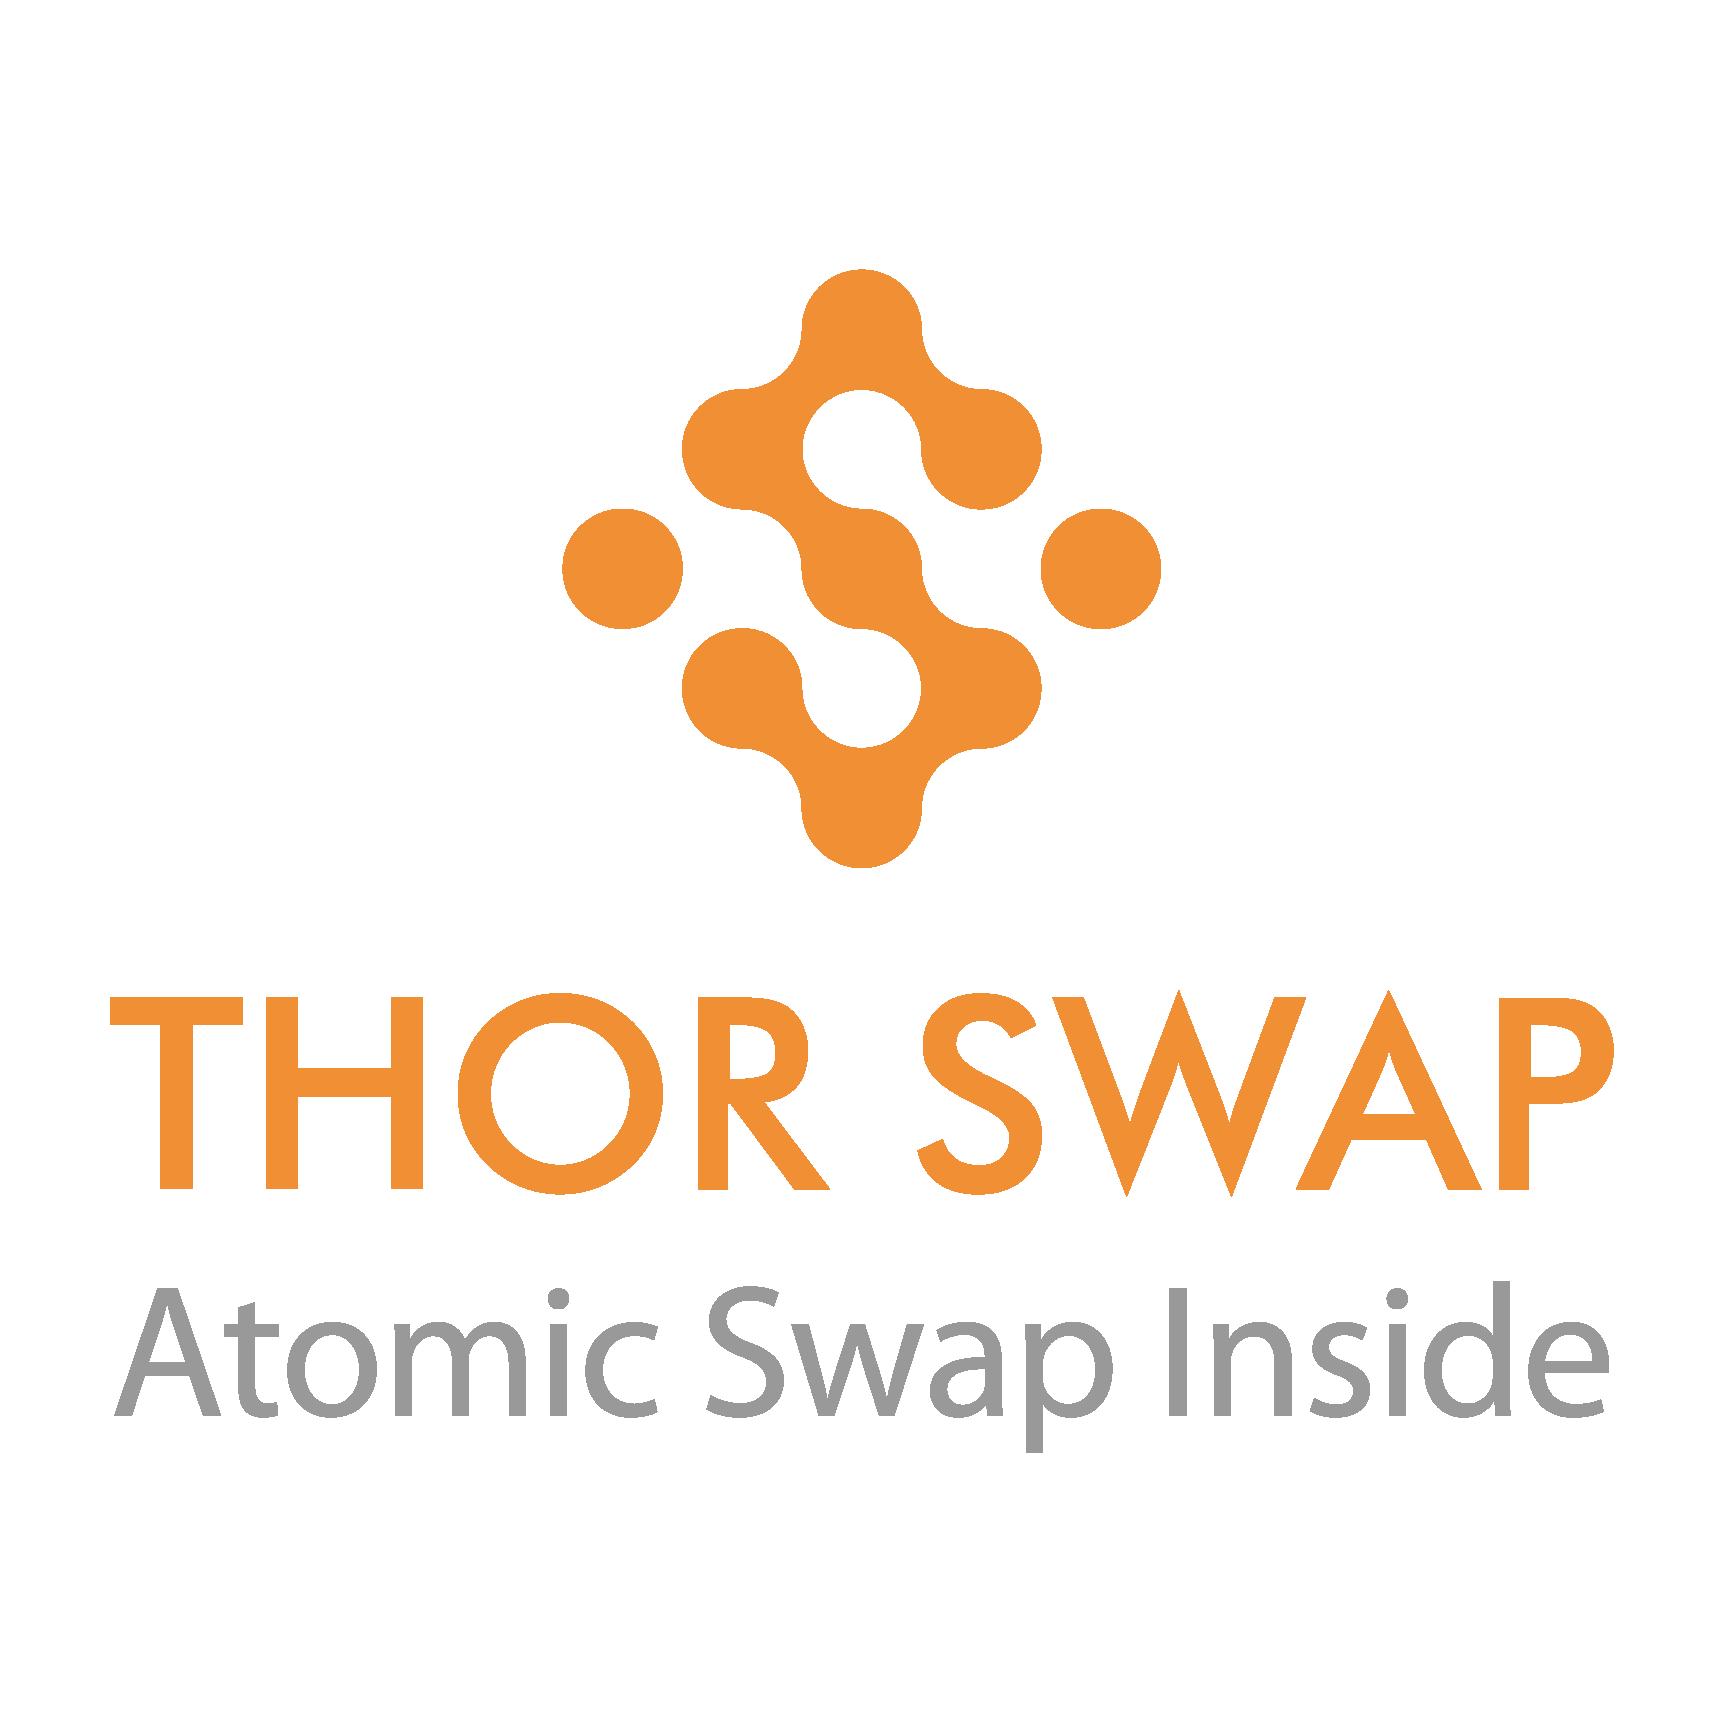 Thor Swap logo